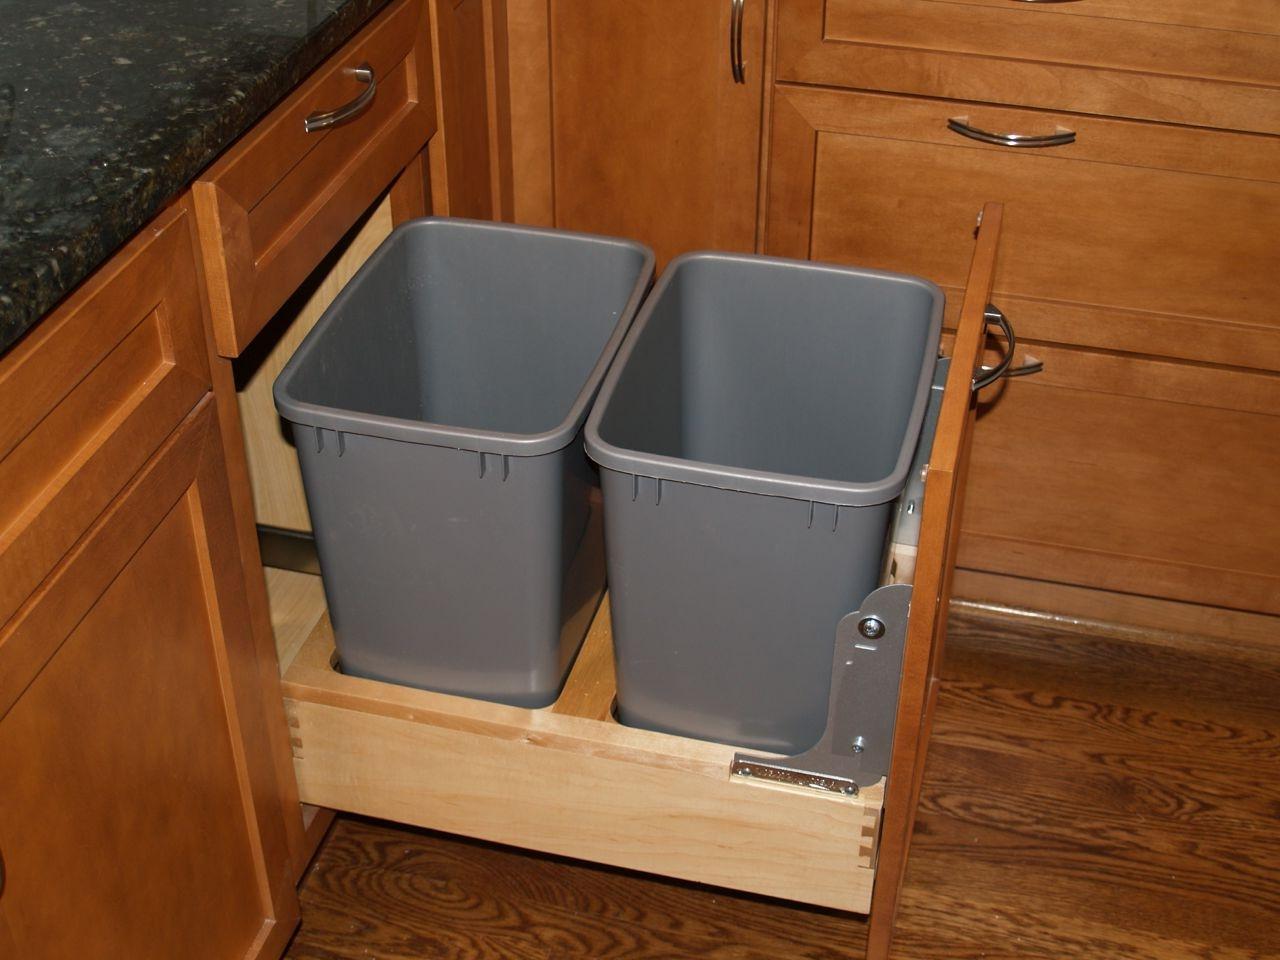 Ikea Recycling Bin More Than Just Waste Sorting Homesfeed